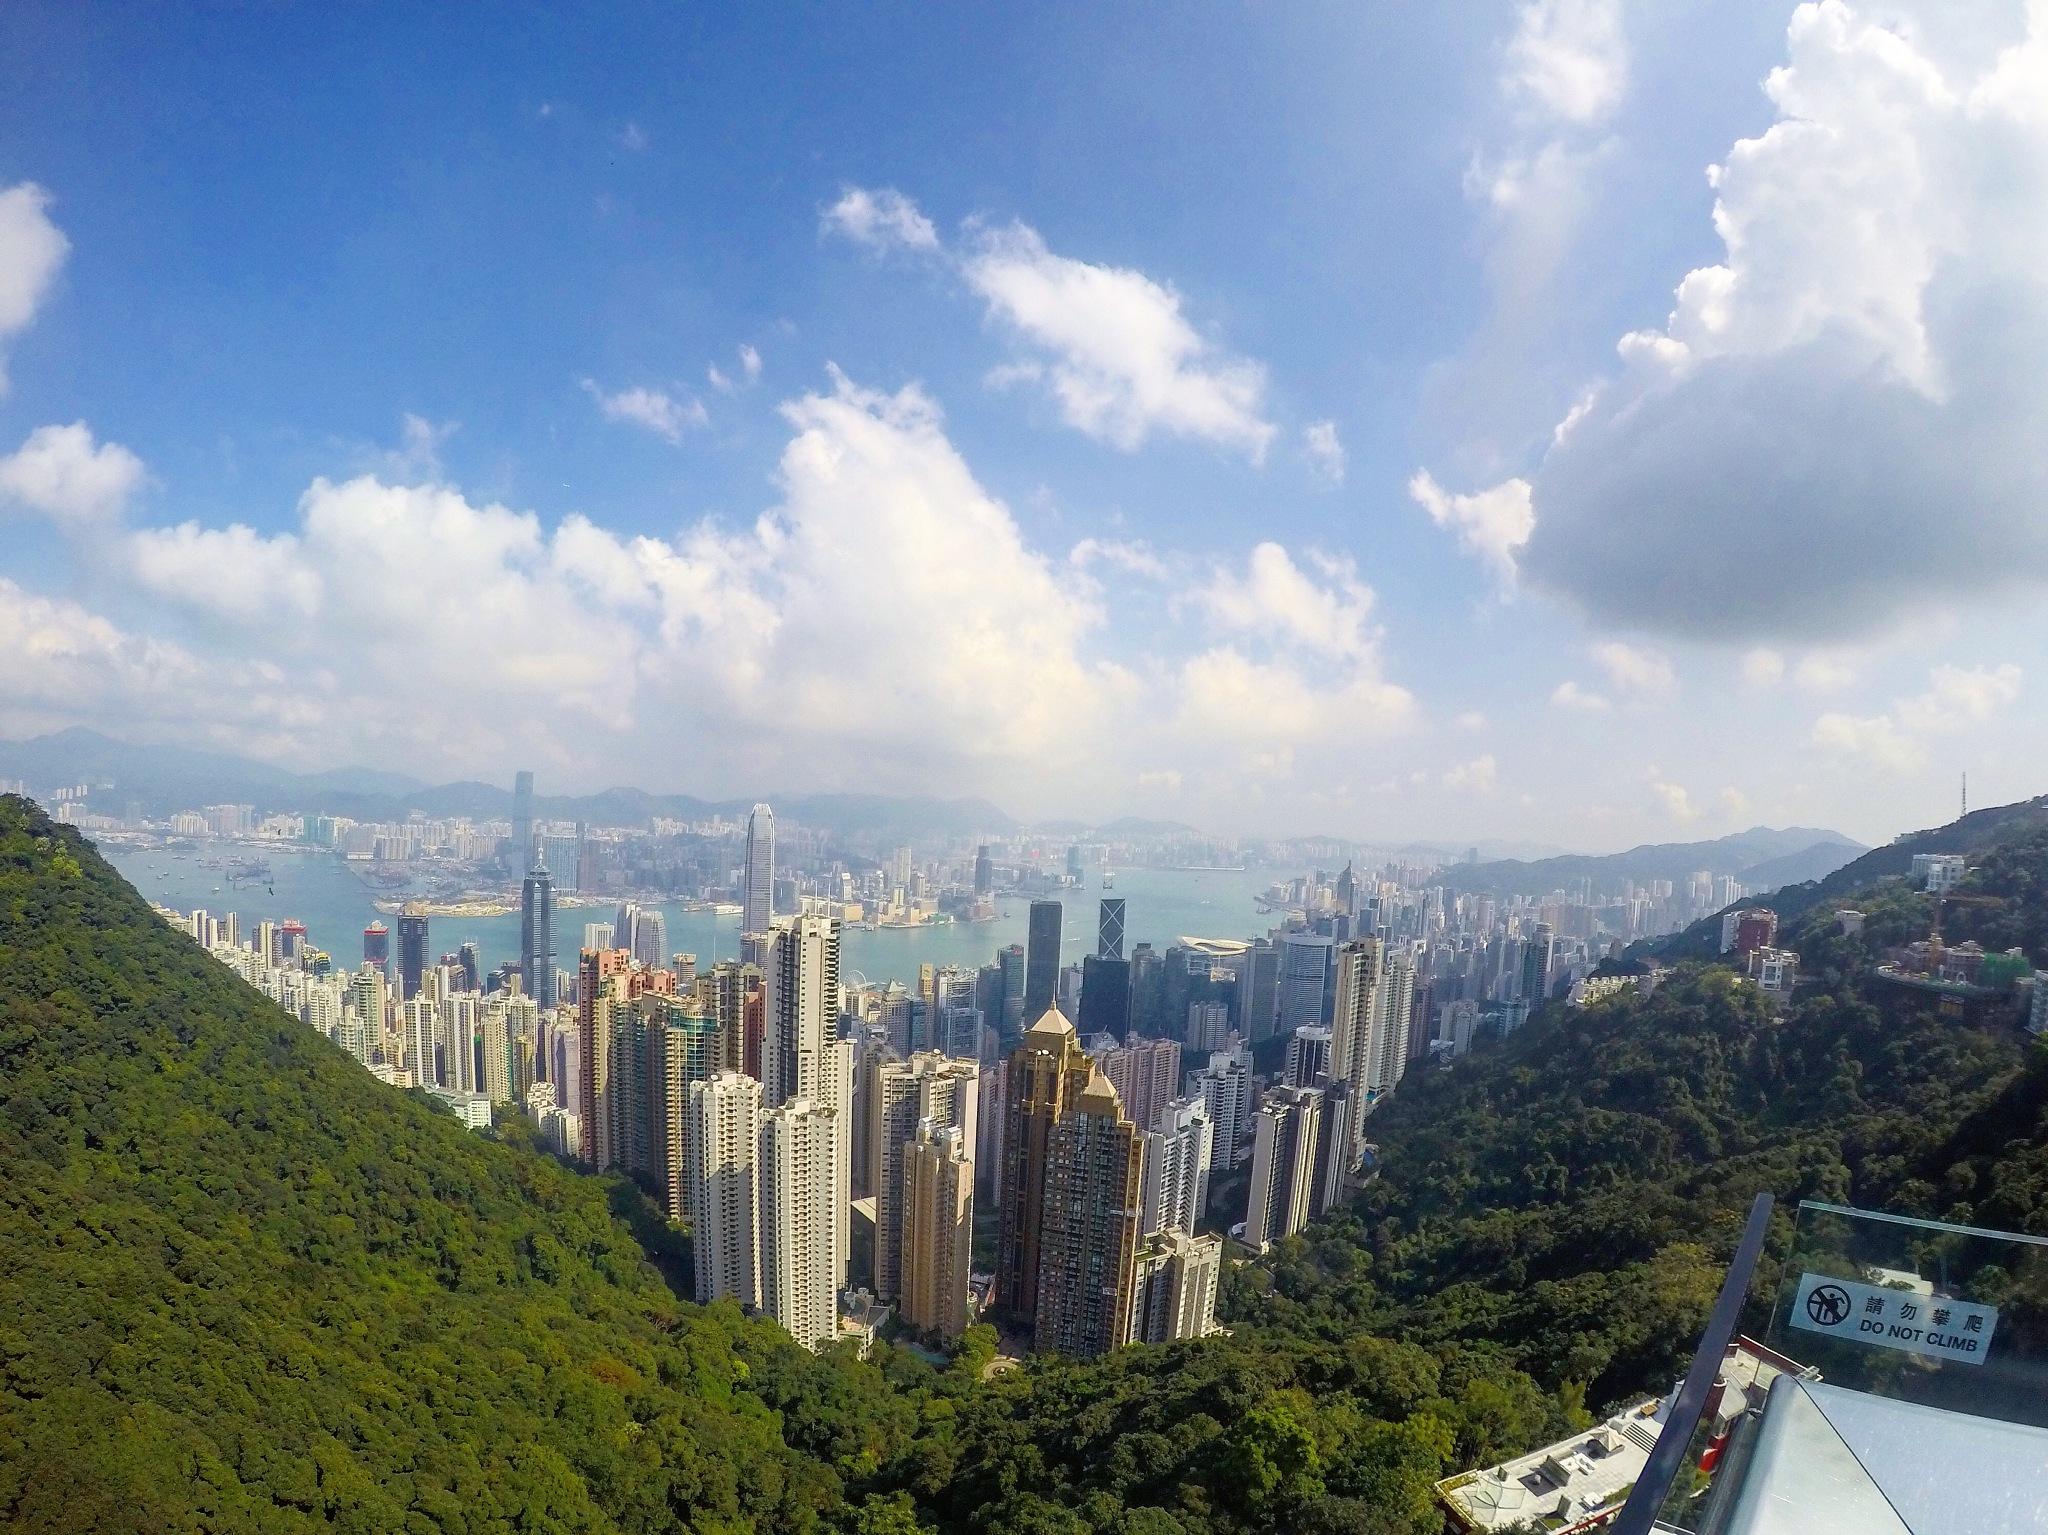 Hong Kong among the clouds by Lkjaye